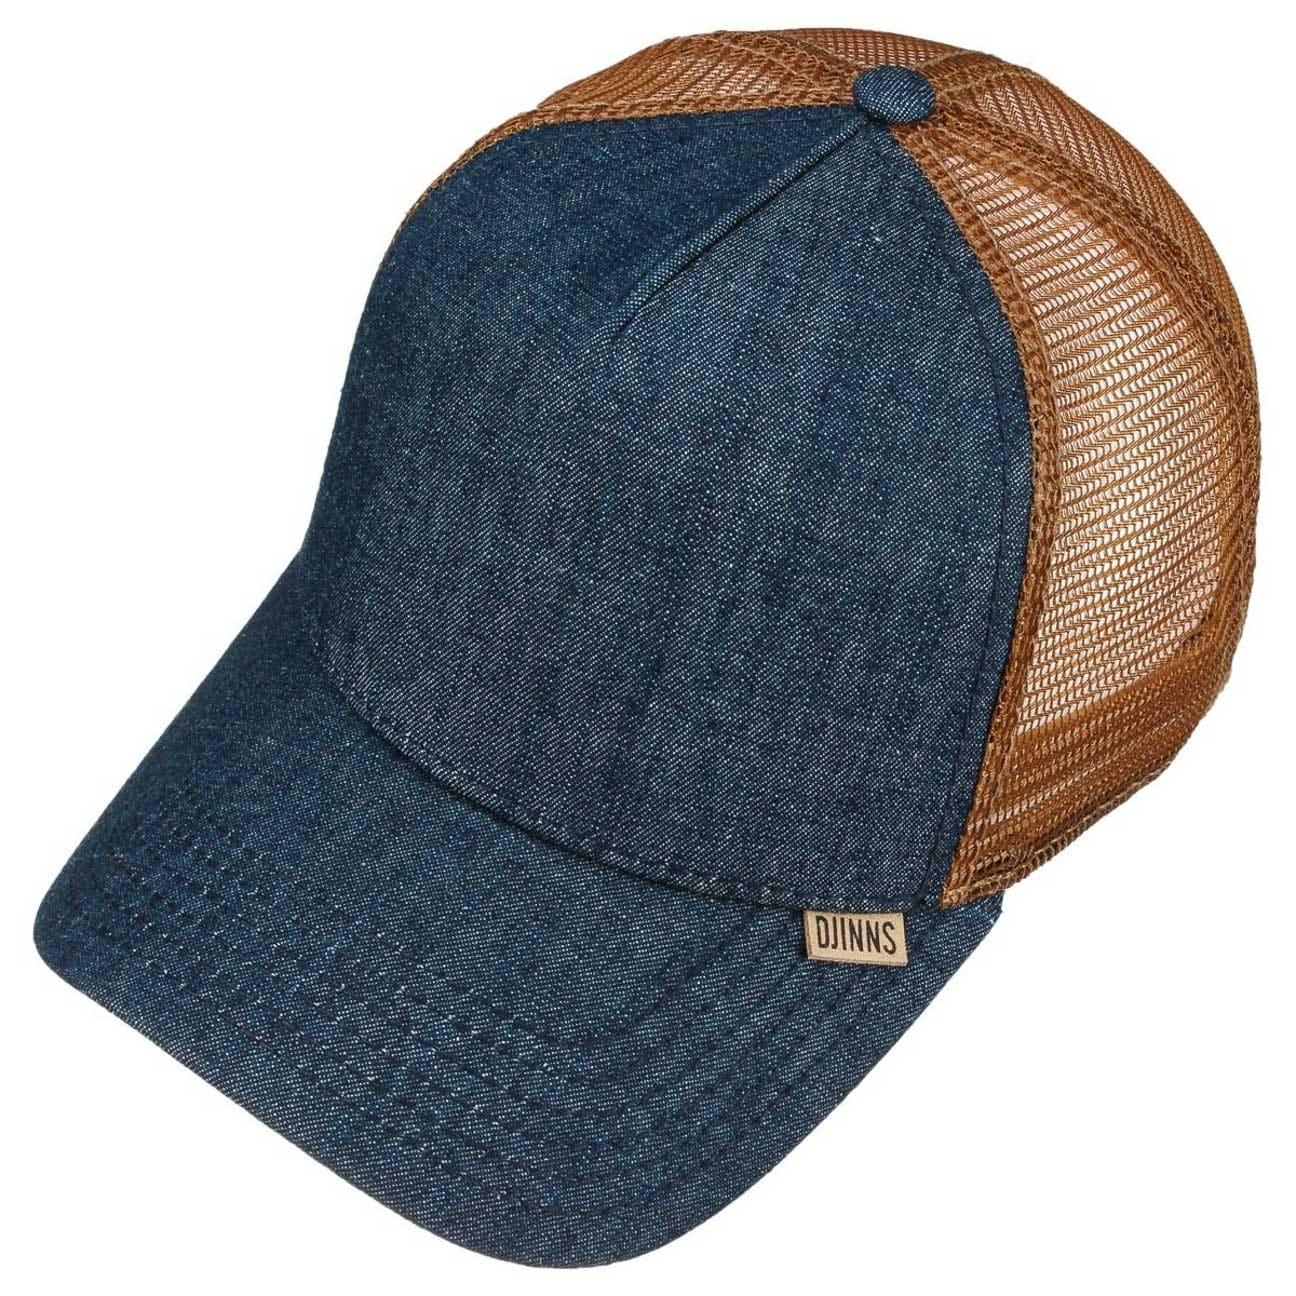 rhomb trucker cap by djinns gbp 20 95 hats caps. Black Bedroom Furniture Sets. Home Design Ideas